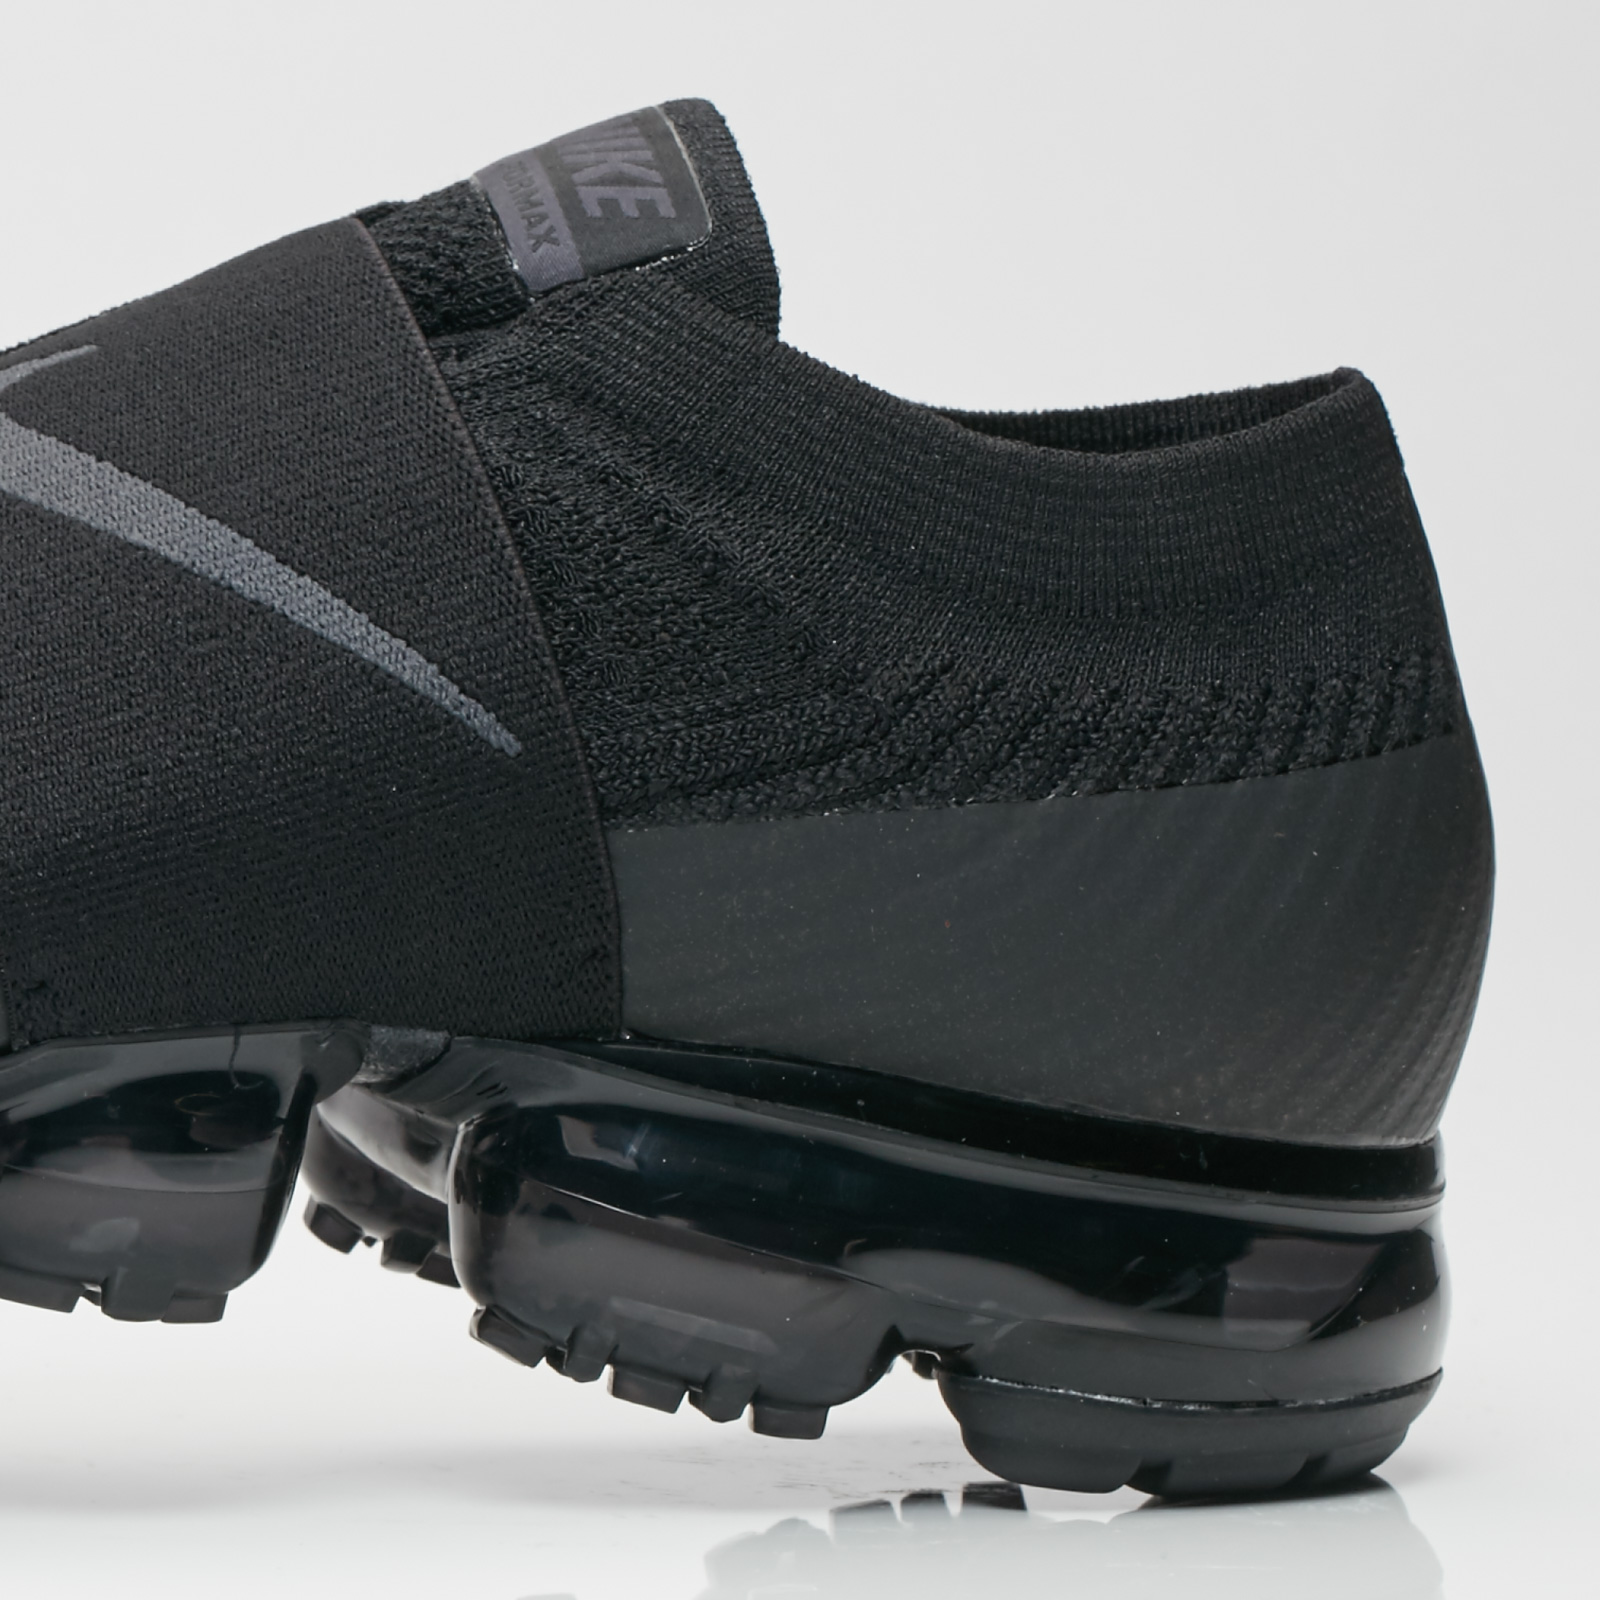 1be026fc14f Nike Sportswear Air Vapormax Flyknit MOC - 6. Close